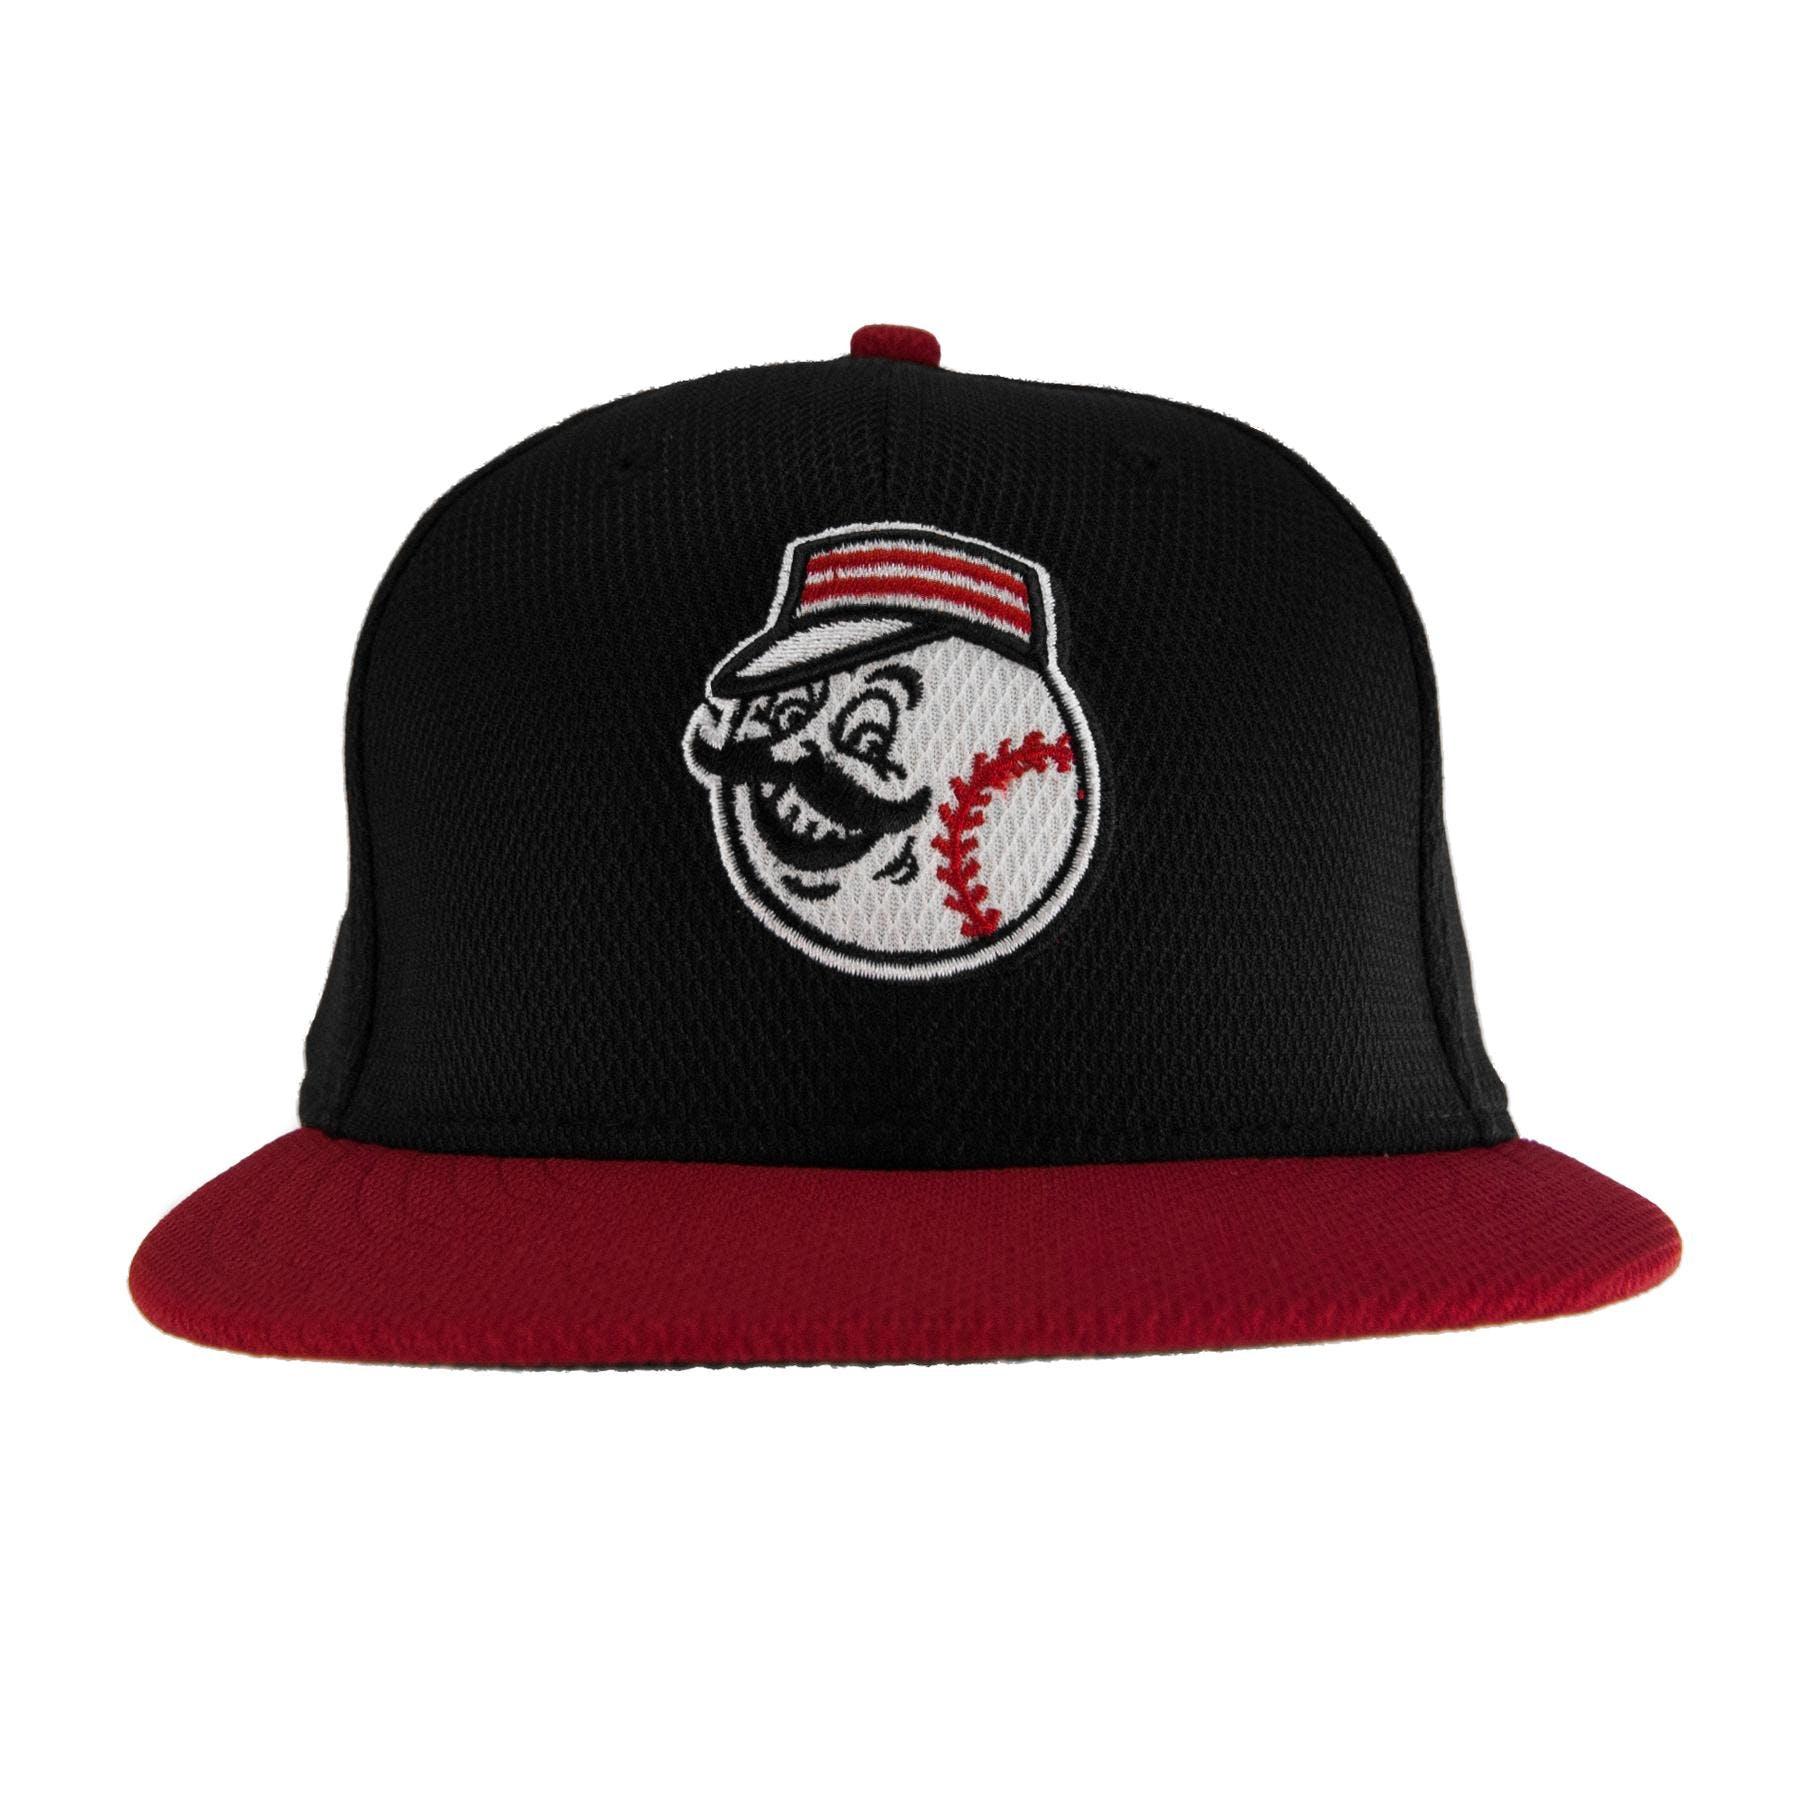 d58f565b83cad Cincinnati Reds New Era Retro Black Diamond Era 59Fifty Fitted Hat ...